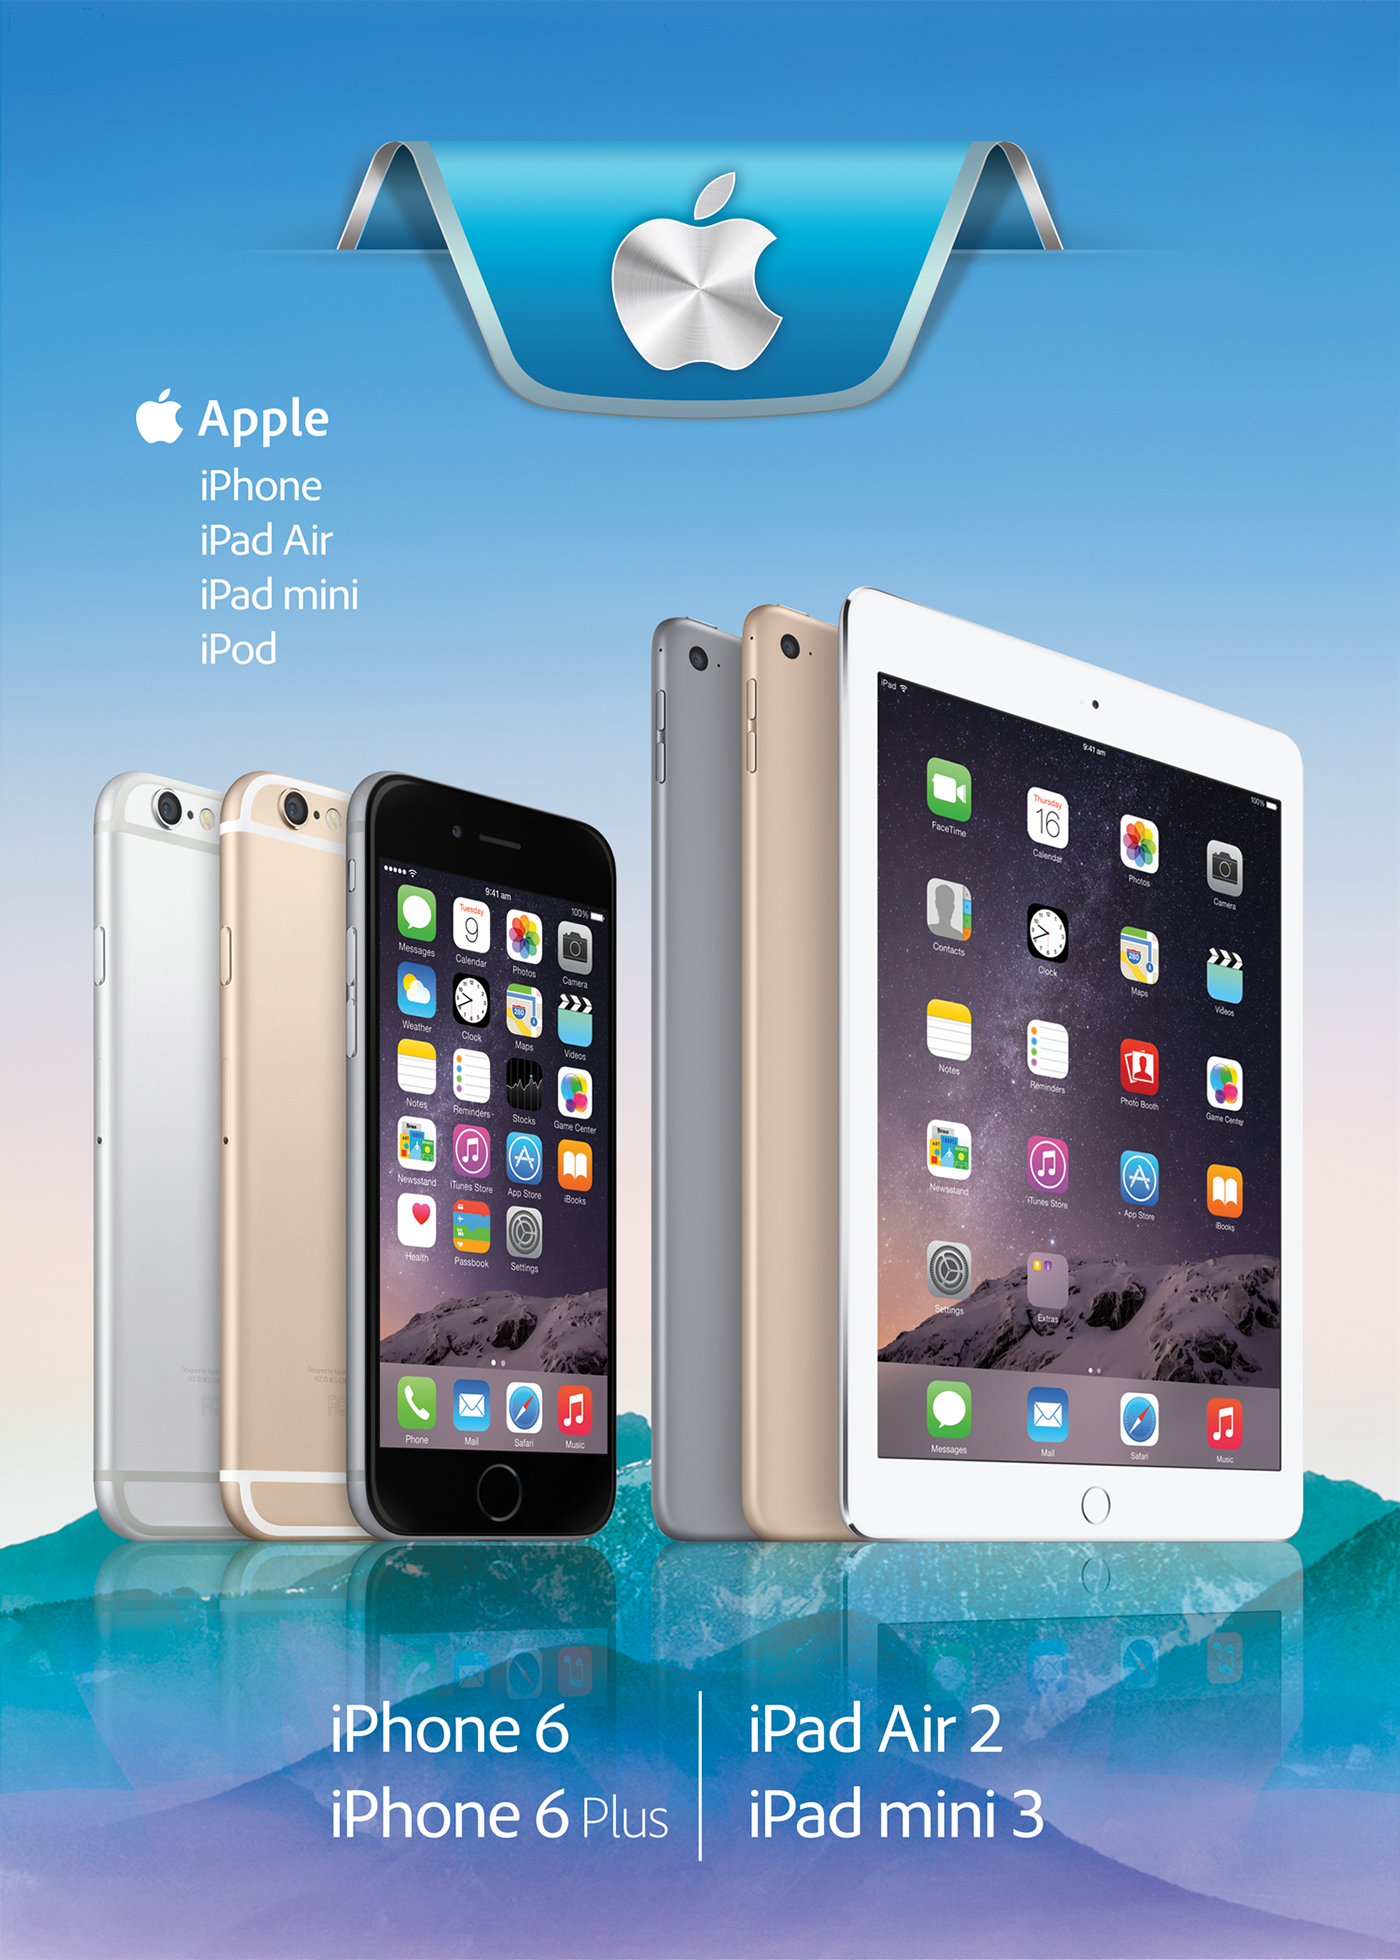 posters apple Samsung huawei iphone iPad handy